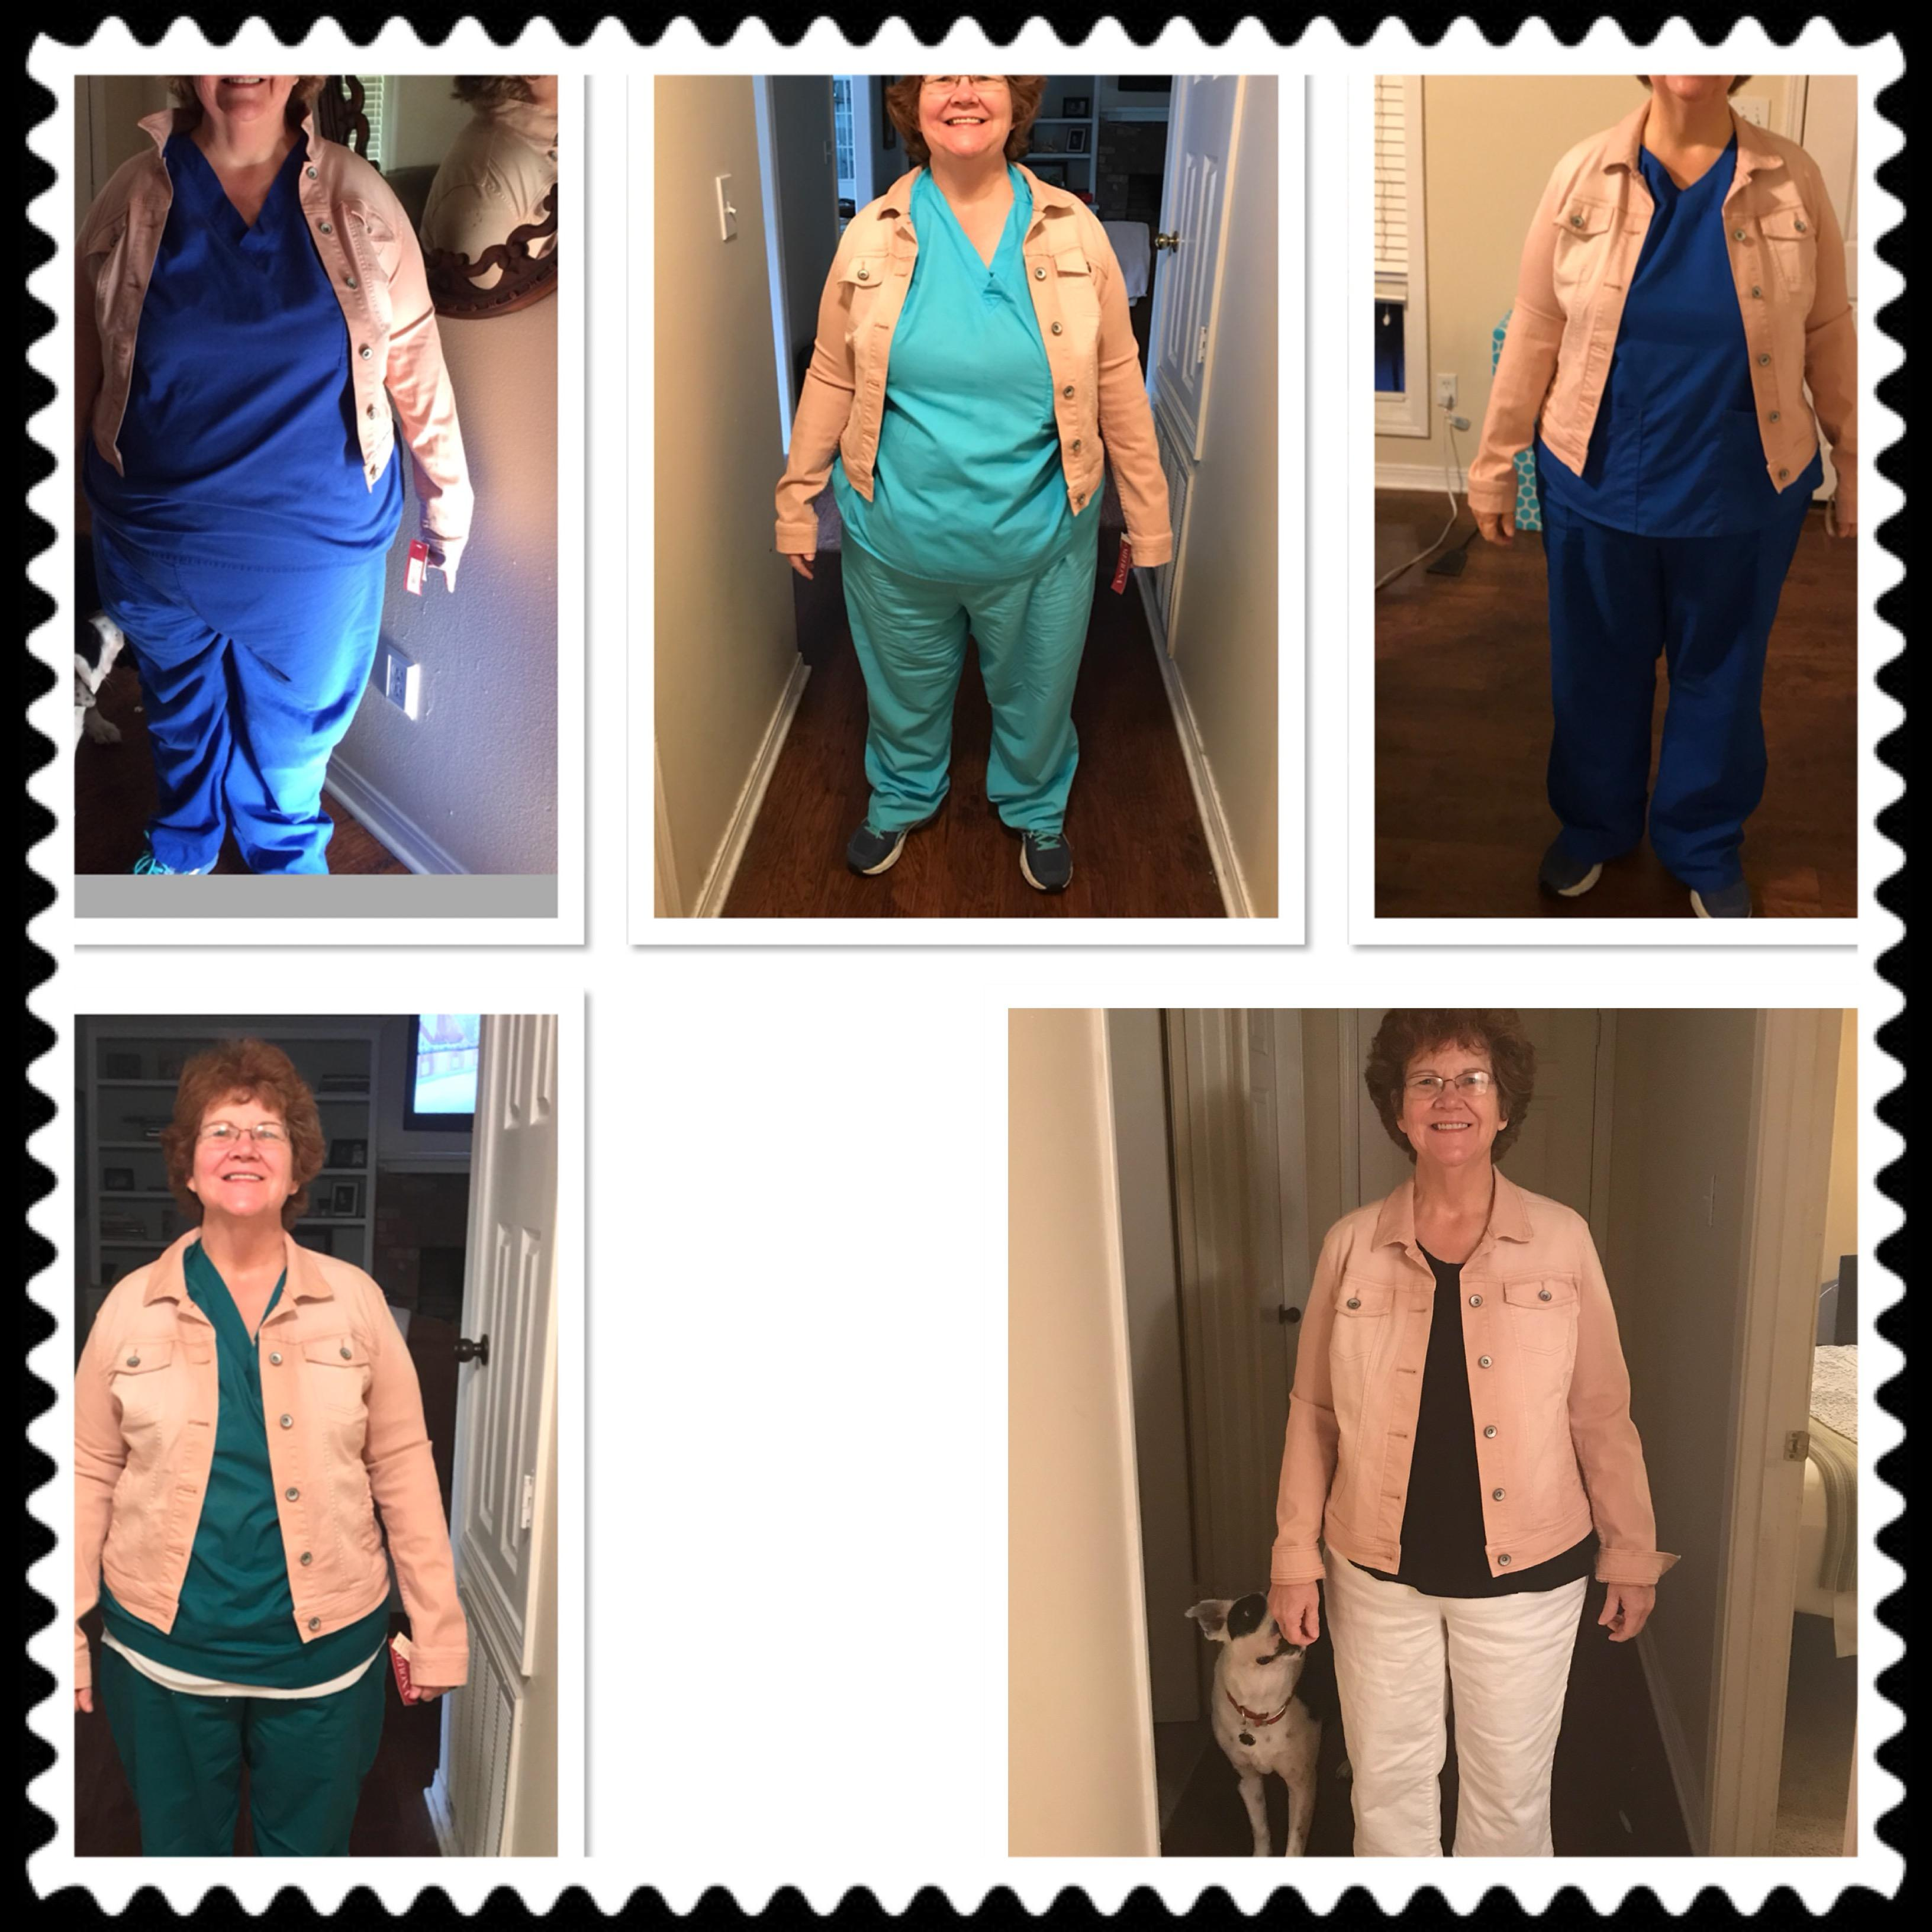 5 foot 6 Female Progress Pics of 100 lbs Weight Loss 283 lbs to 183 lbs